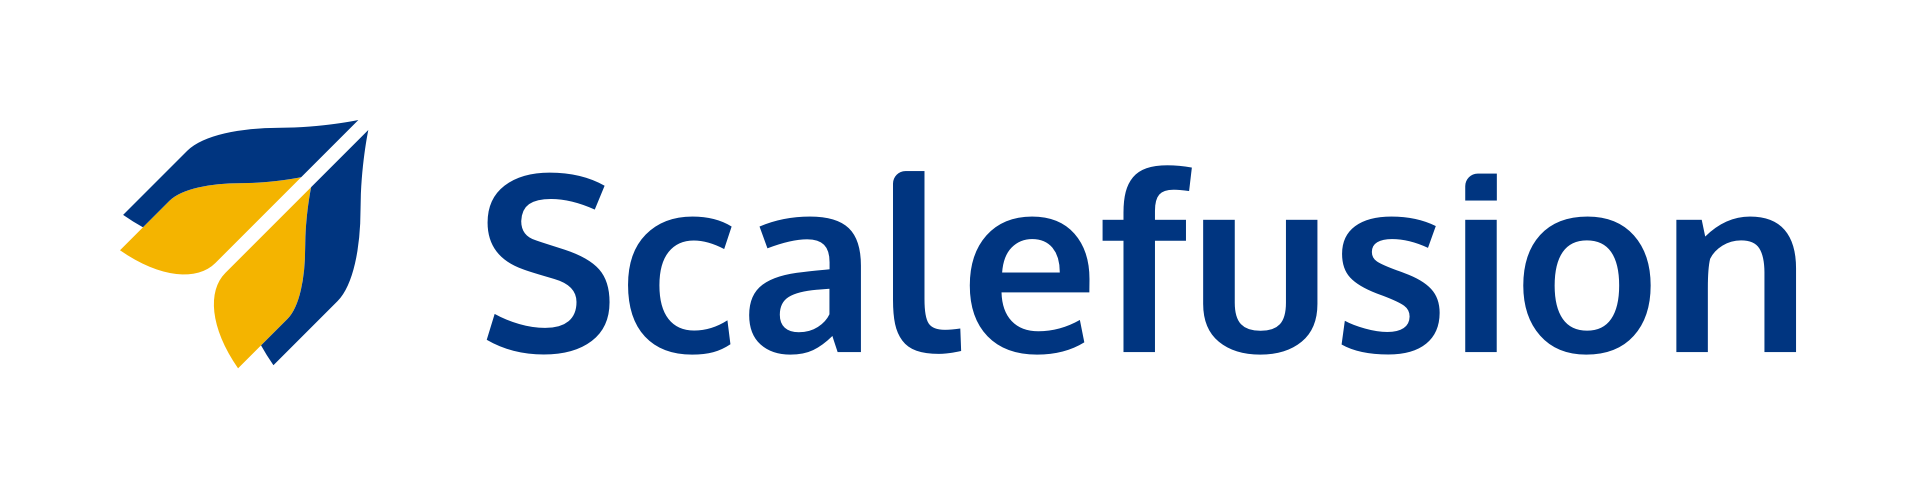 Scalefusion (Formerly MobiLock Pro) logo